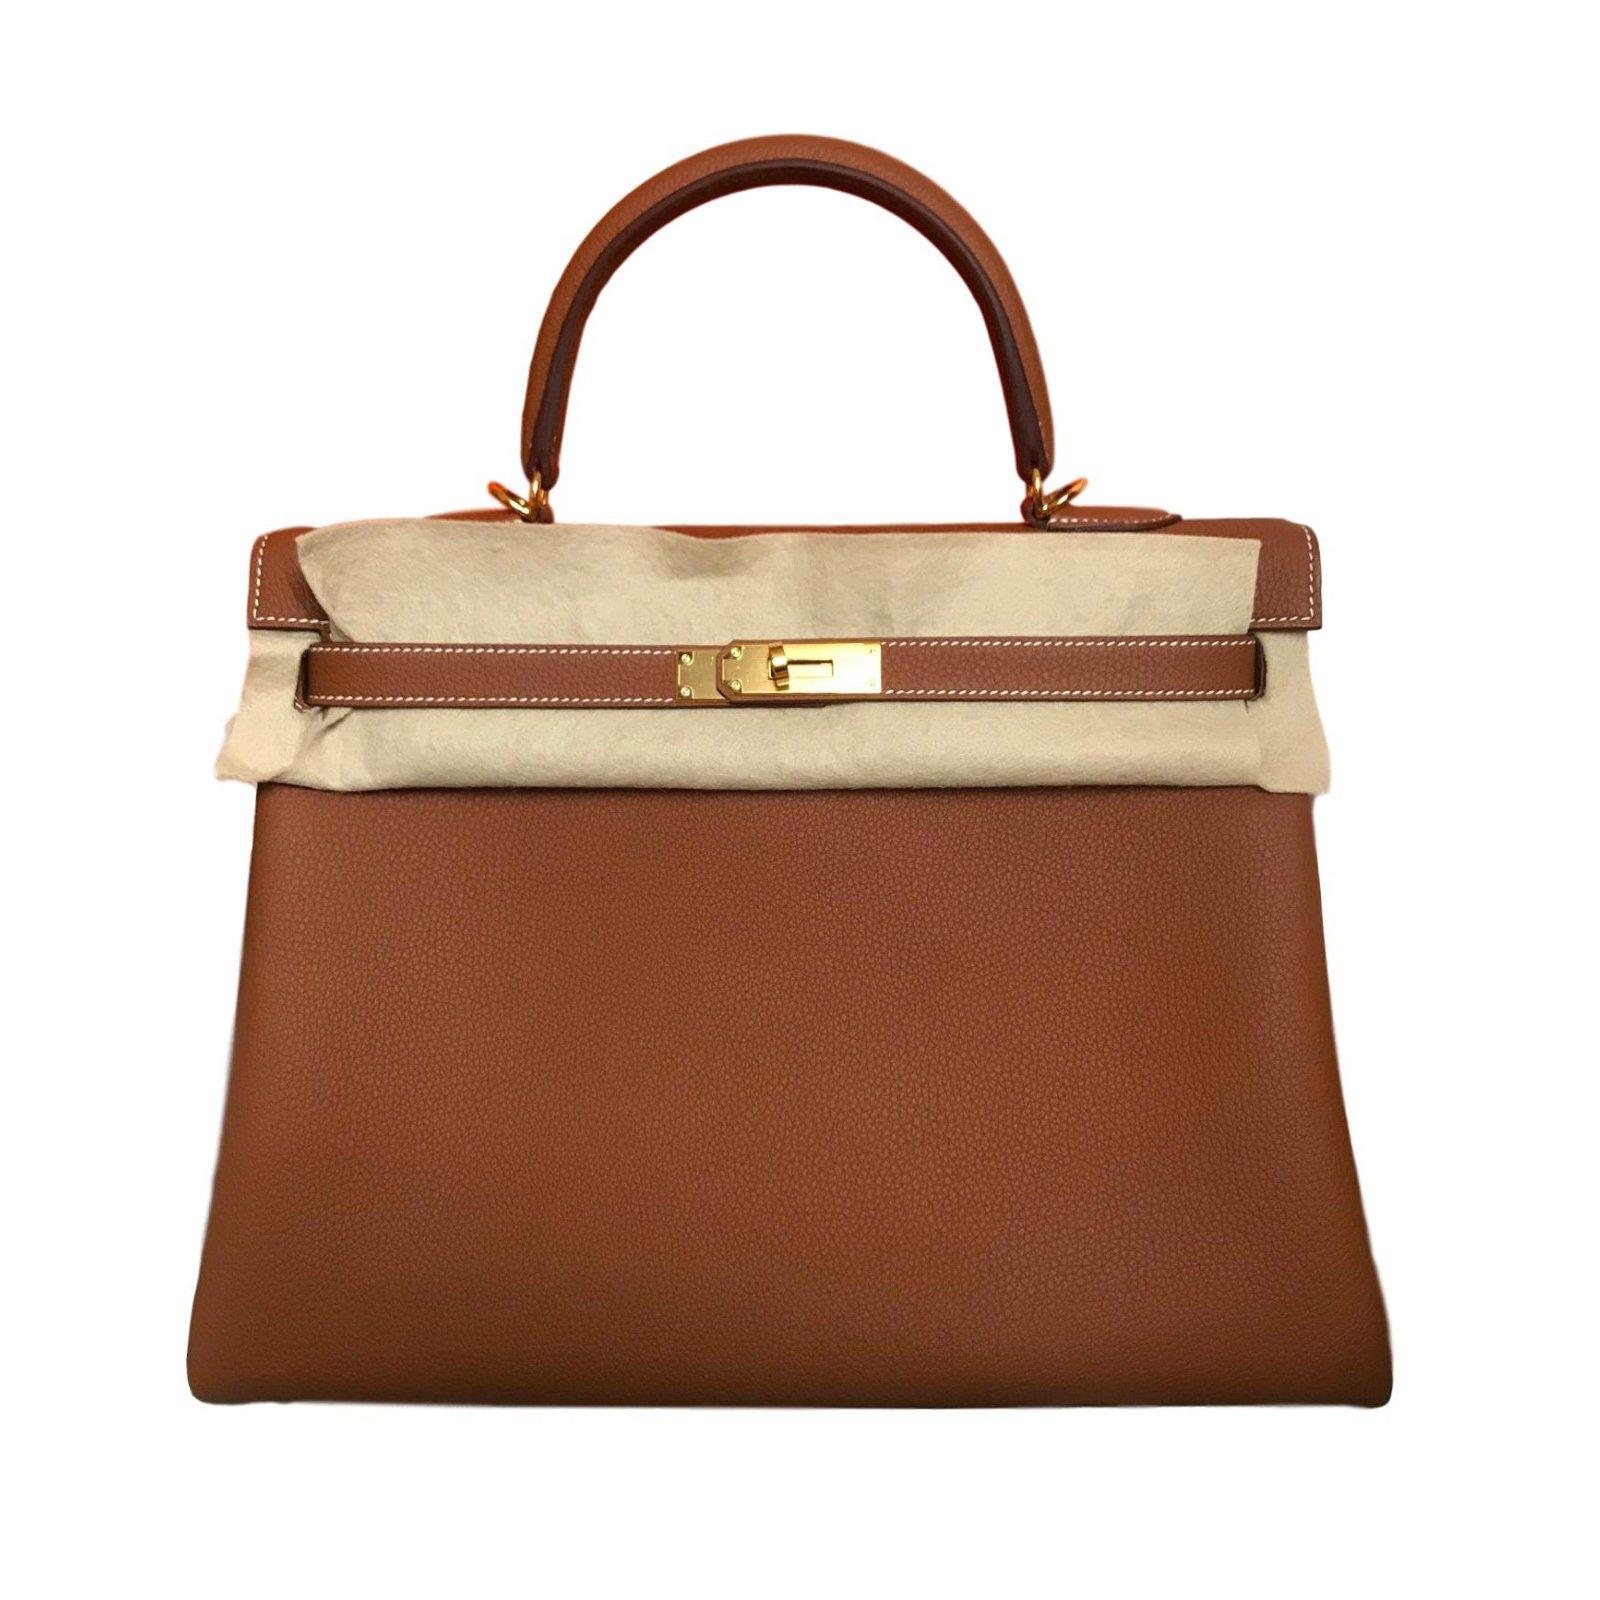 805ccbb145b5 Hermès Kelly 35 Handbags Leather Caramel ref.58814 - Joli Closet